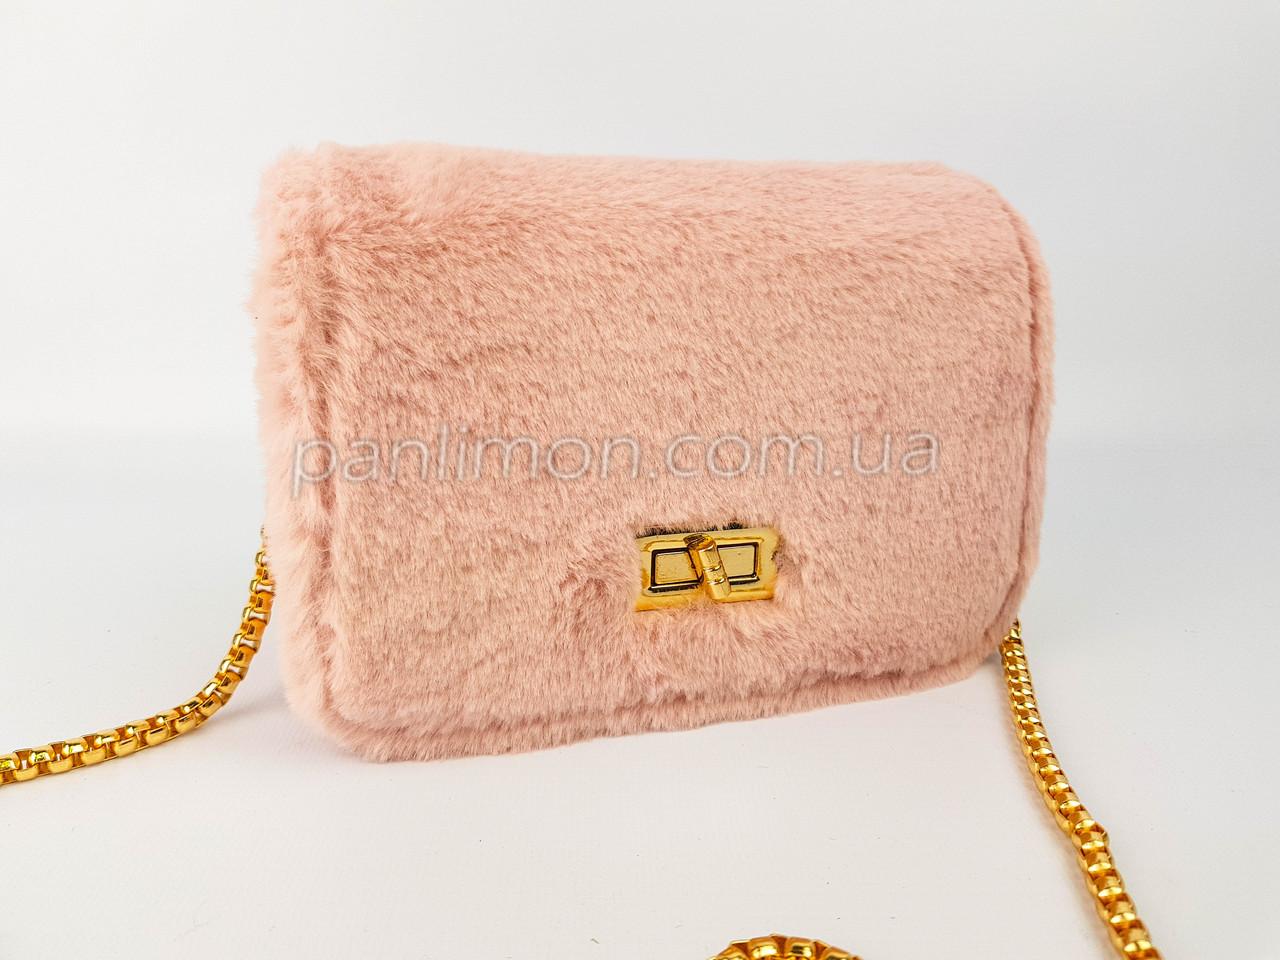 Сумочка розовый мех на цепочке 207-29